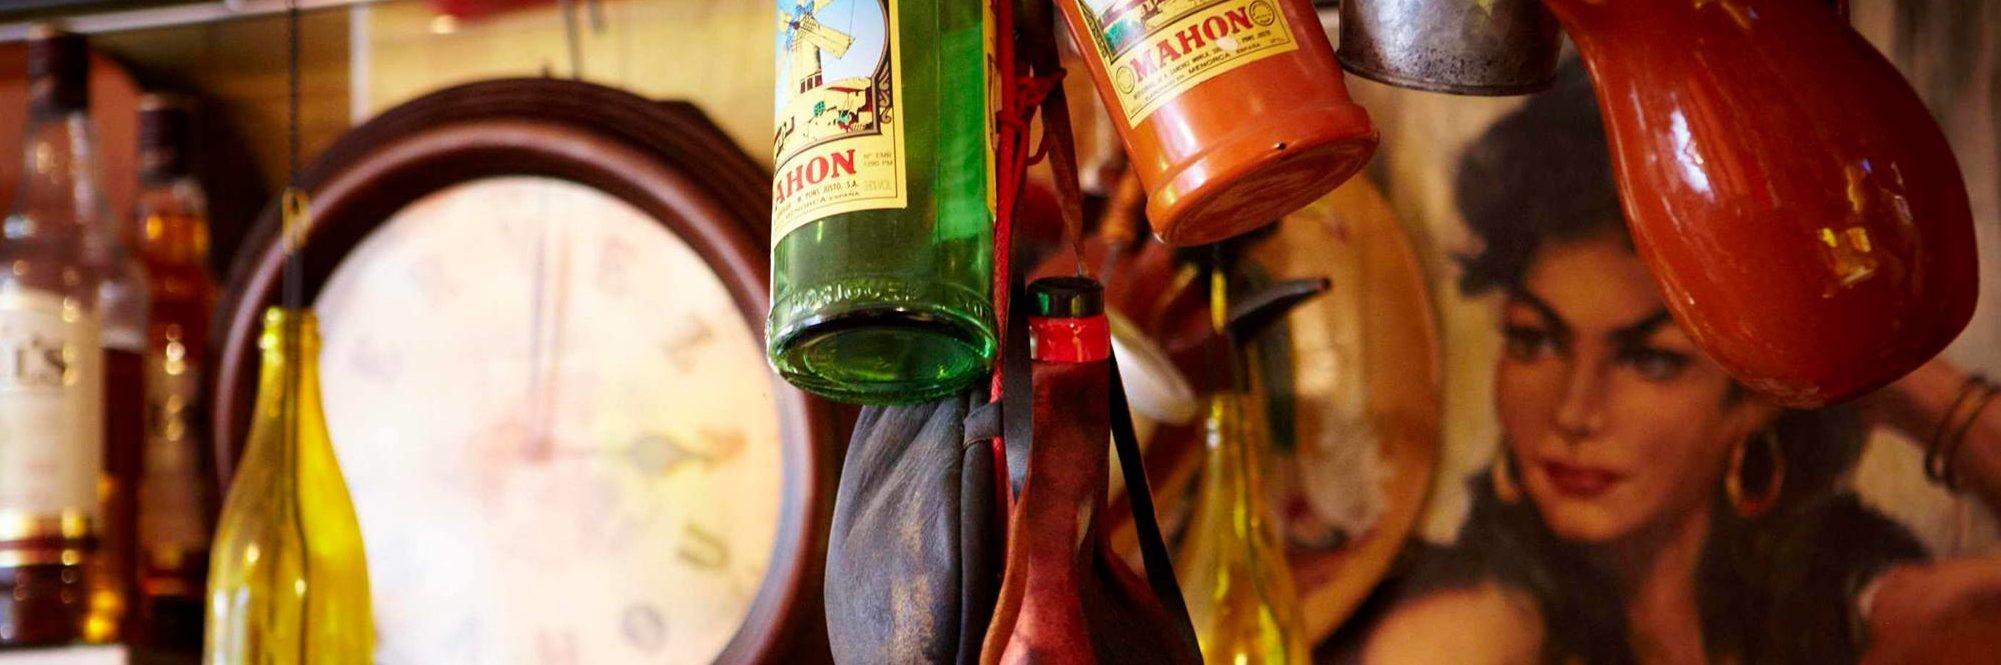 The tiny interior has a distinctly Spanish style at Bar San Juan in Chorlton